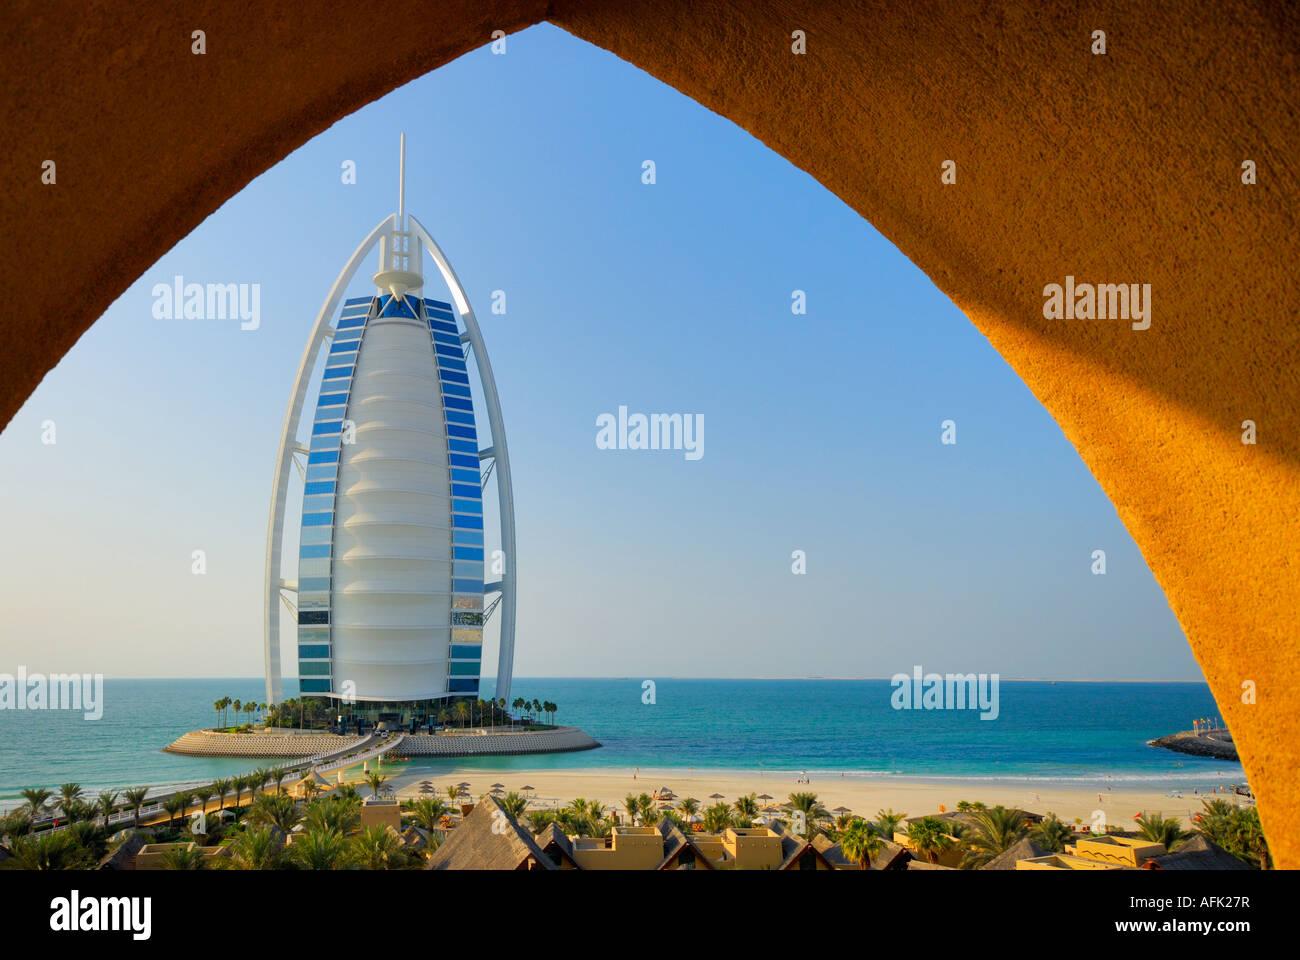 Wadi Water Park e hotel Burj Al Arab Burj al-Arab, Dubai, Emirati Arabi Uniti Immagini Stock